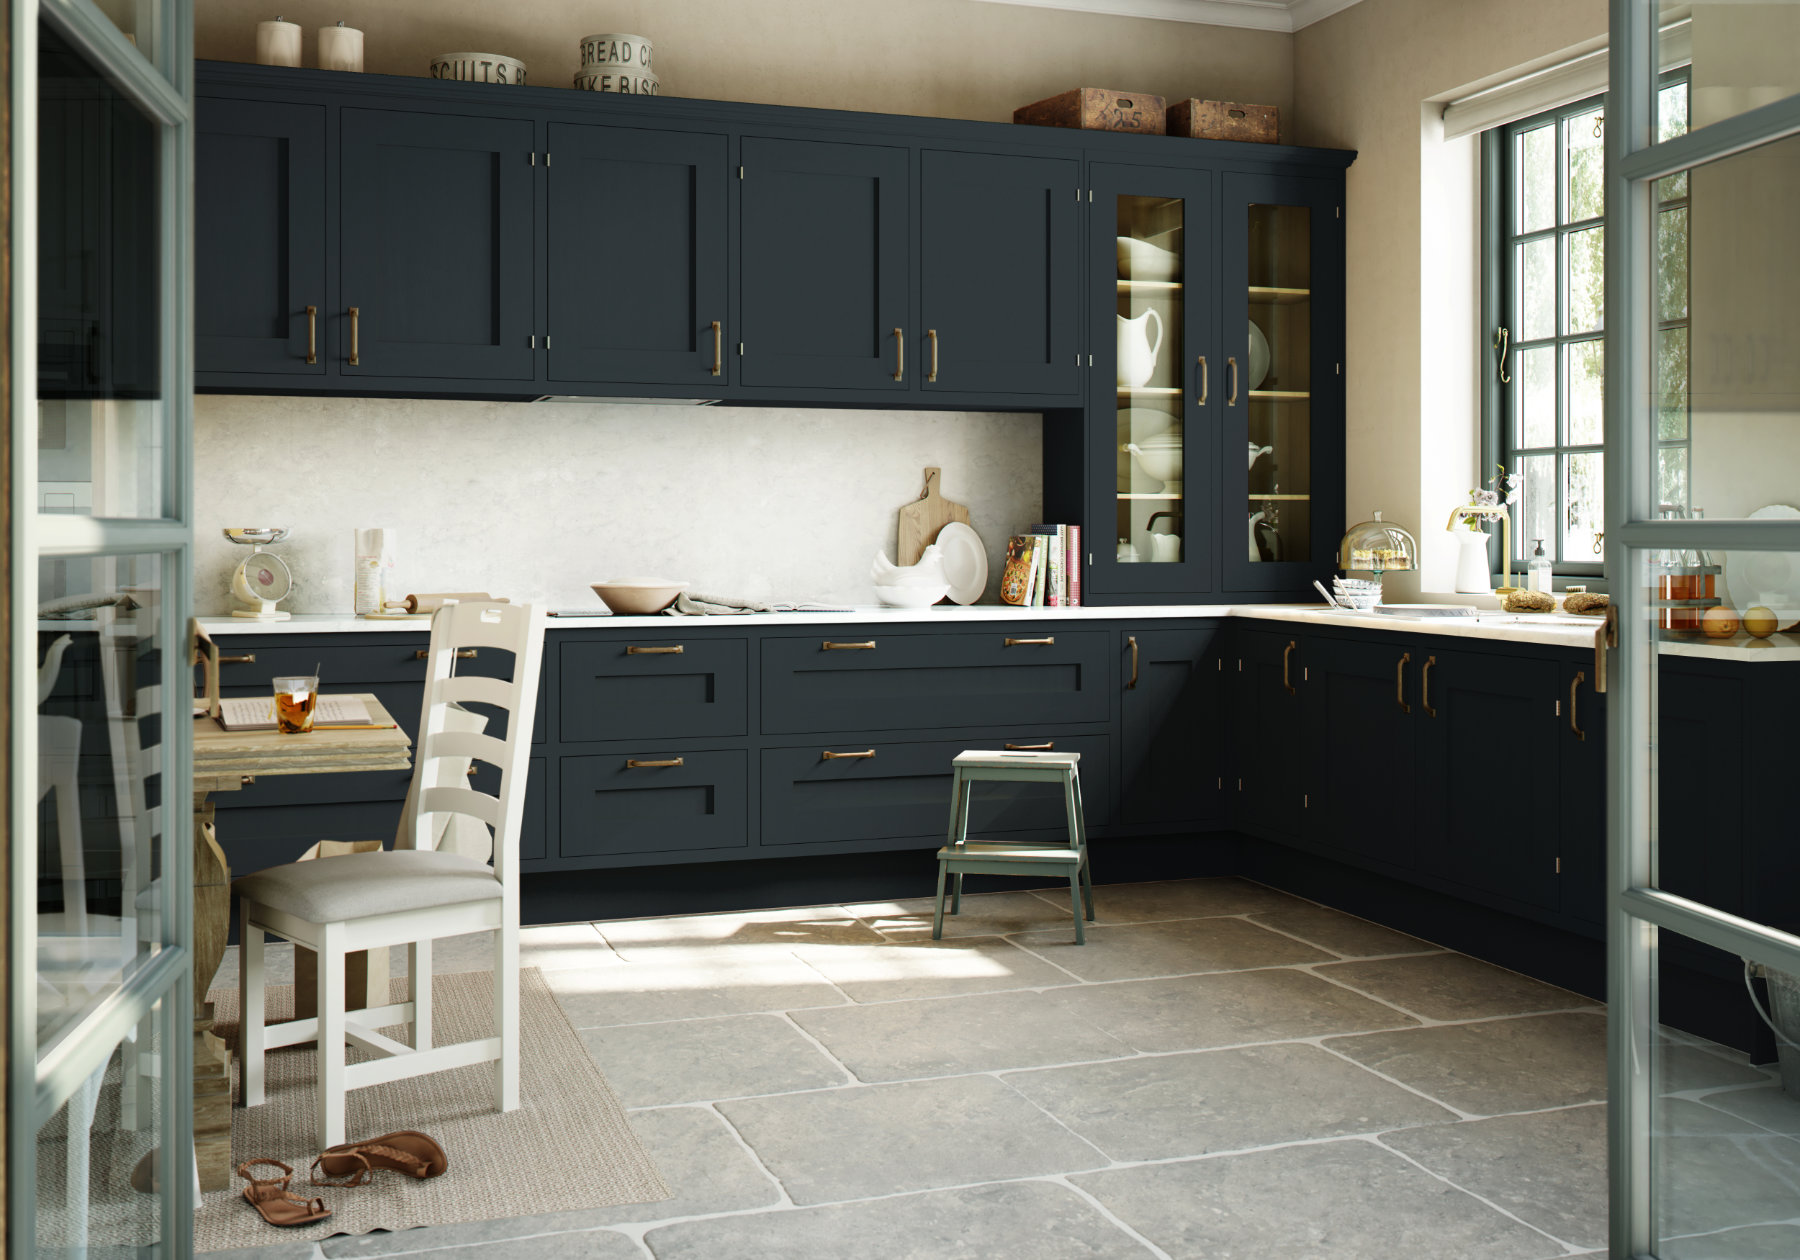 Manor Interiors Navy Shaker Kitchen | MHK Kitchen Experts